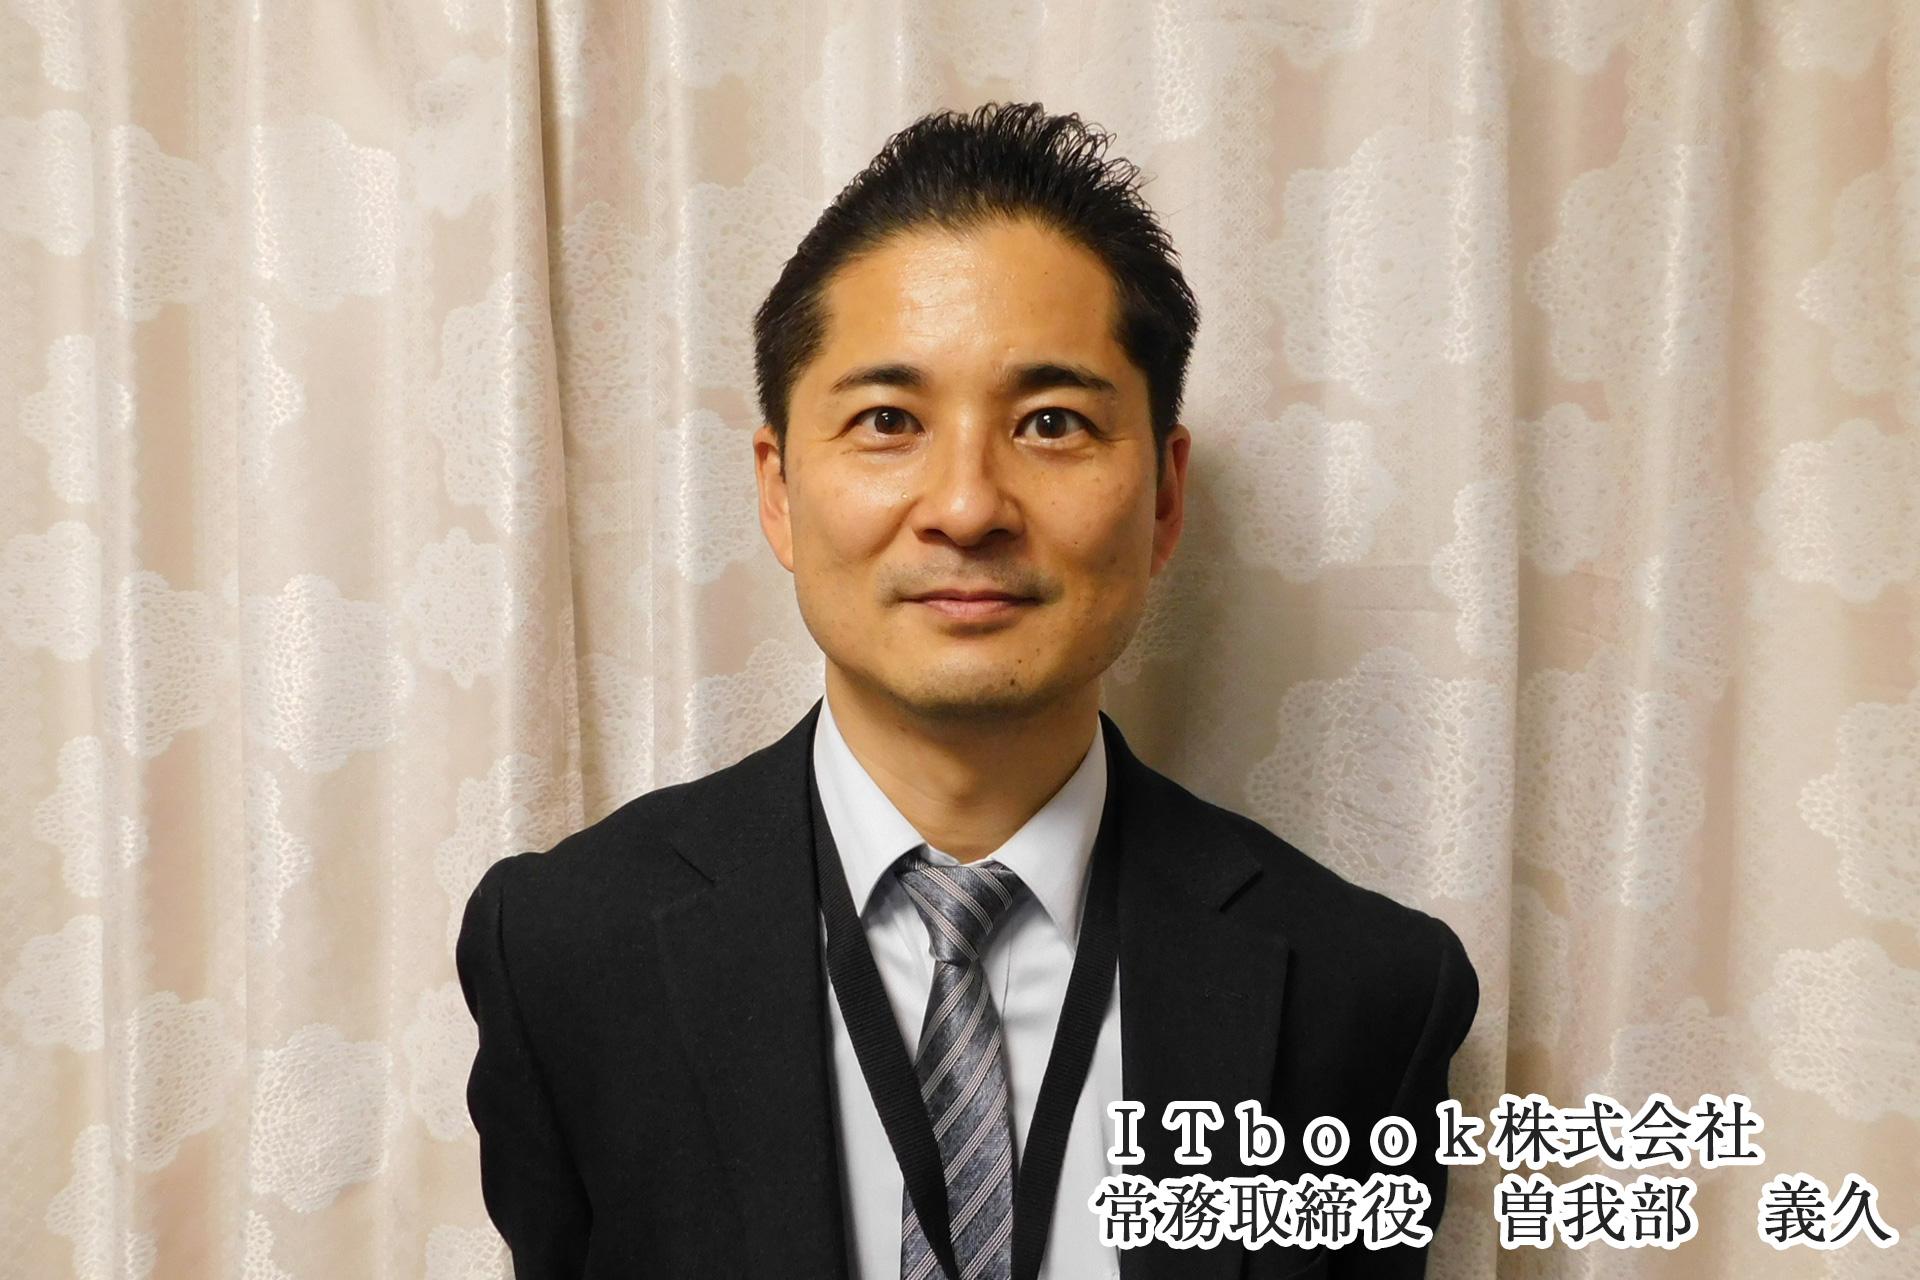 ITbook株式会社 常務取締役